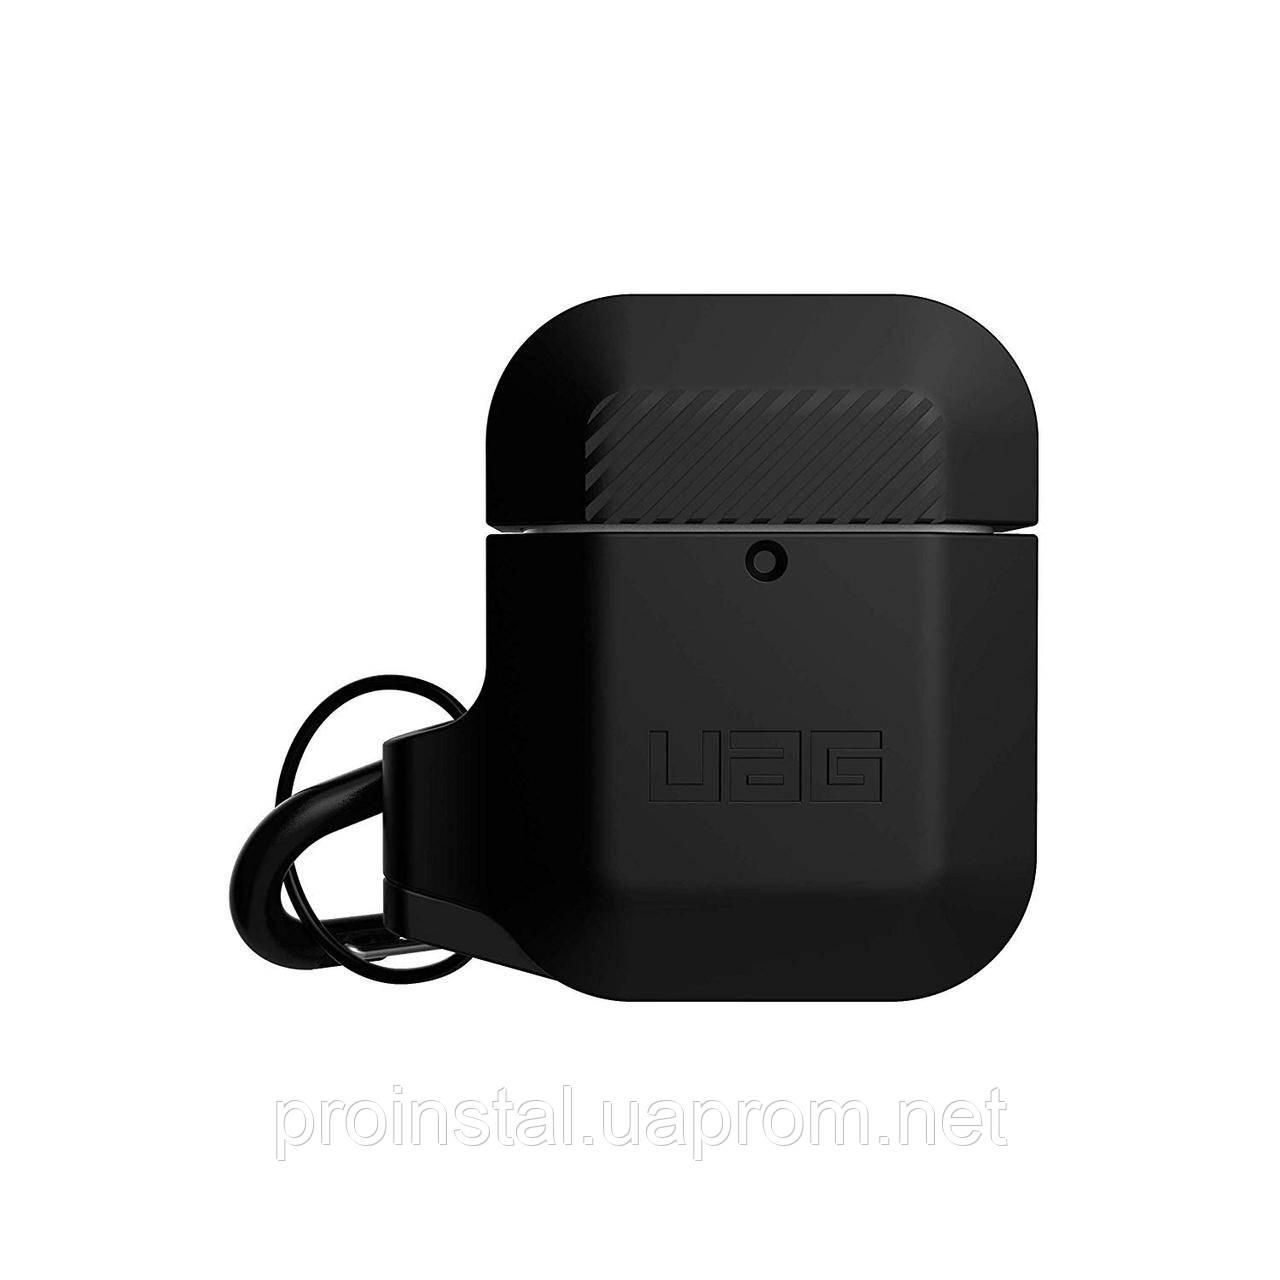 Чехол UAG для AirPods Silicone, Black/Black